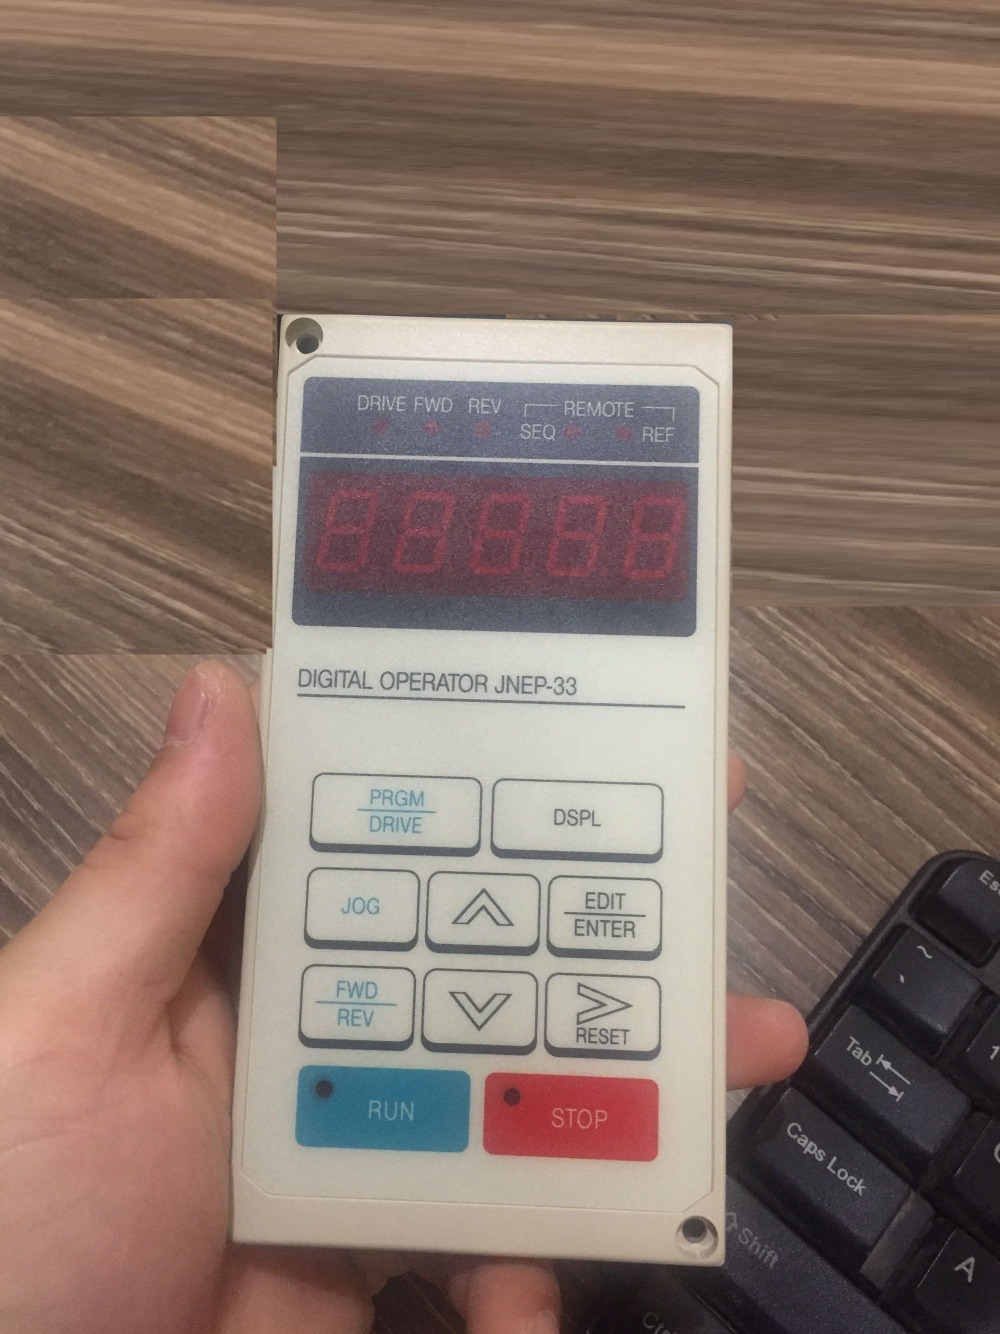 Inverter operation panel JNEP 33